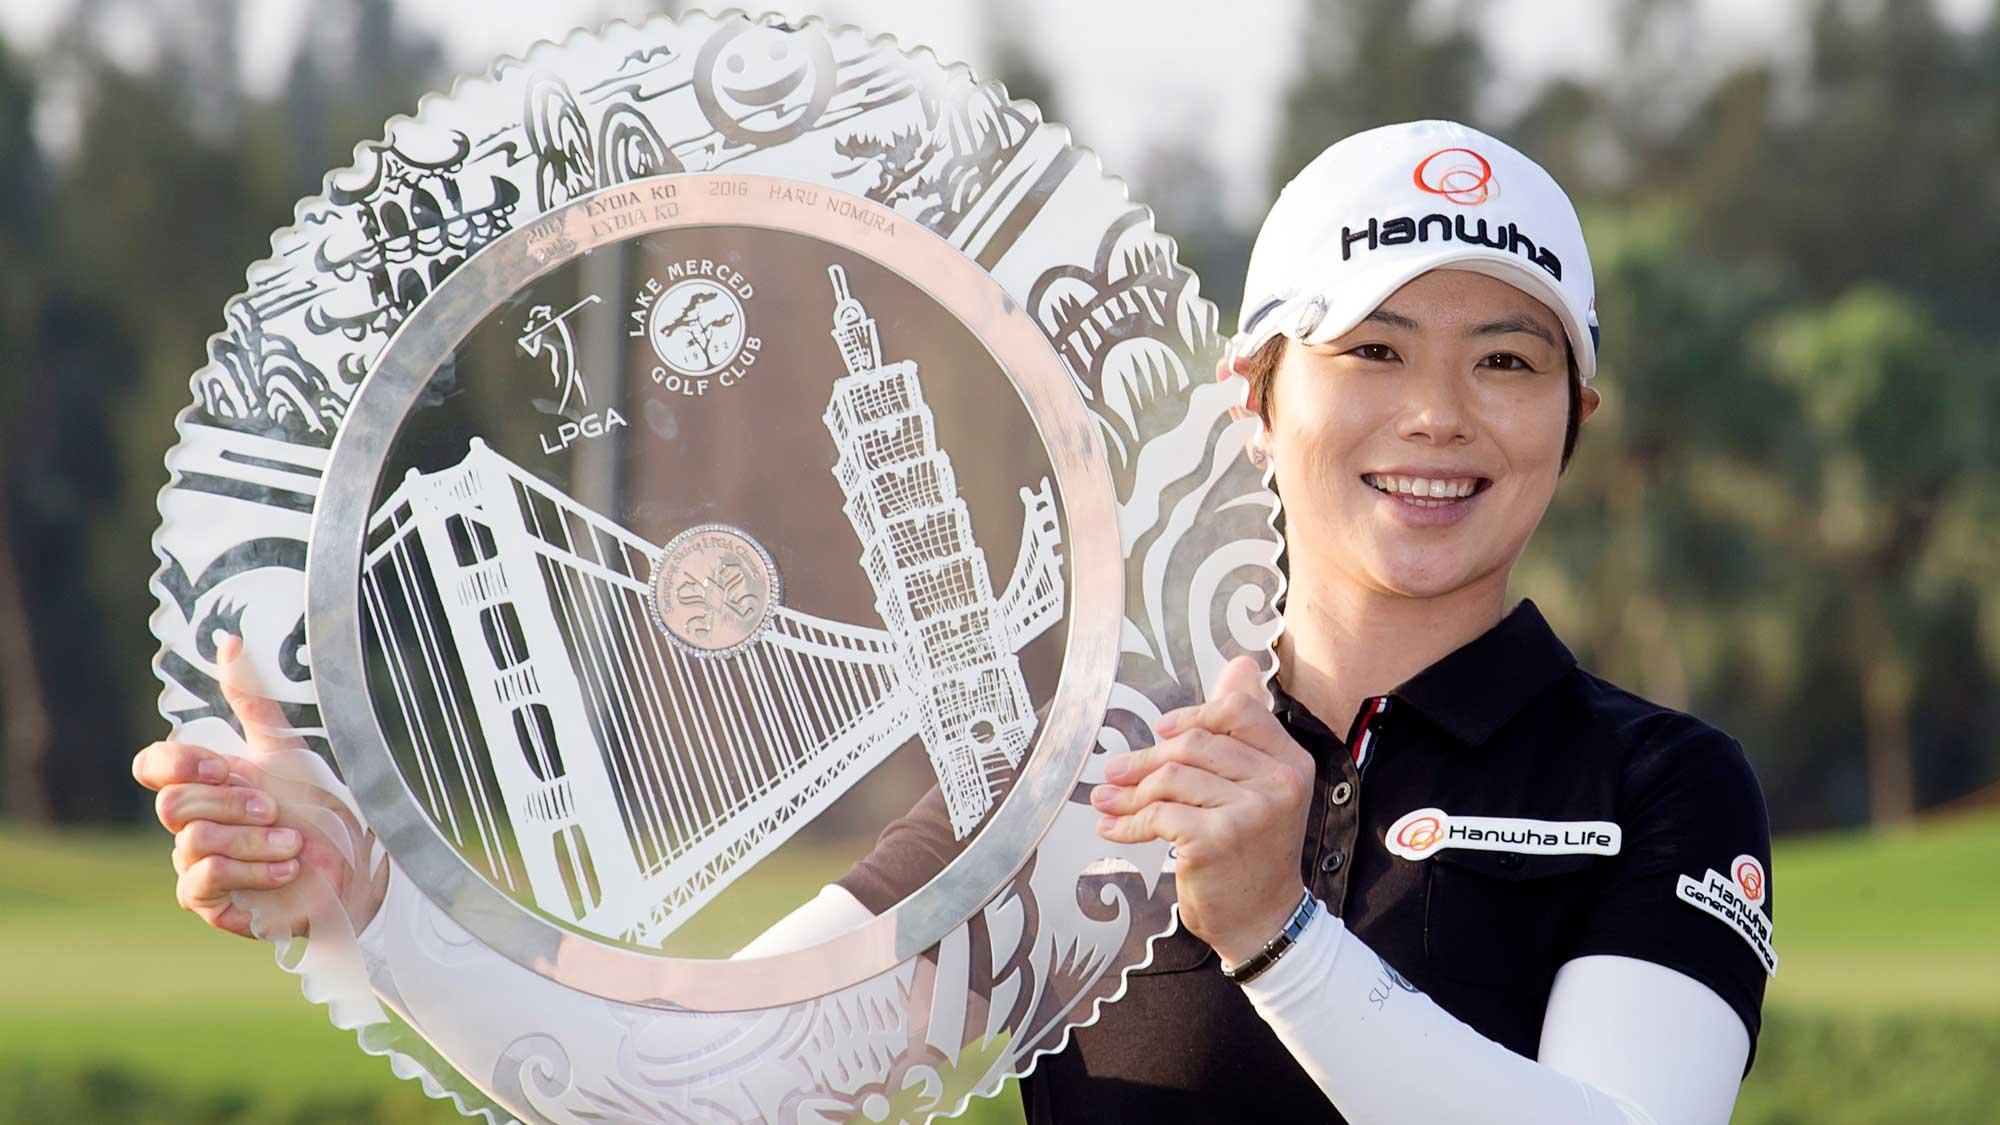 Senior Tour Senior Open Championship Presented By Rolex